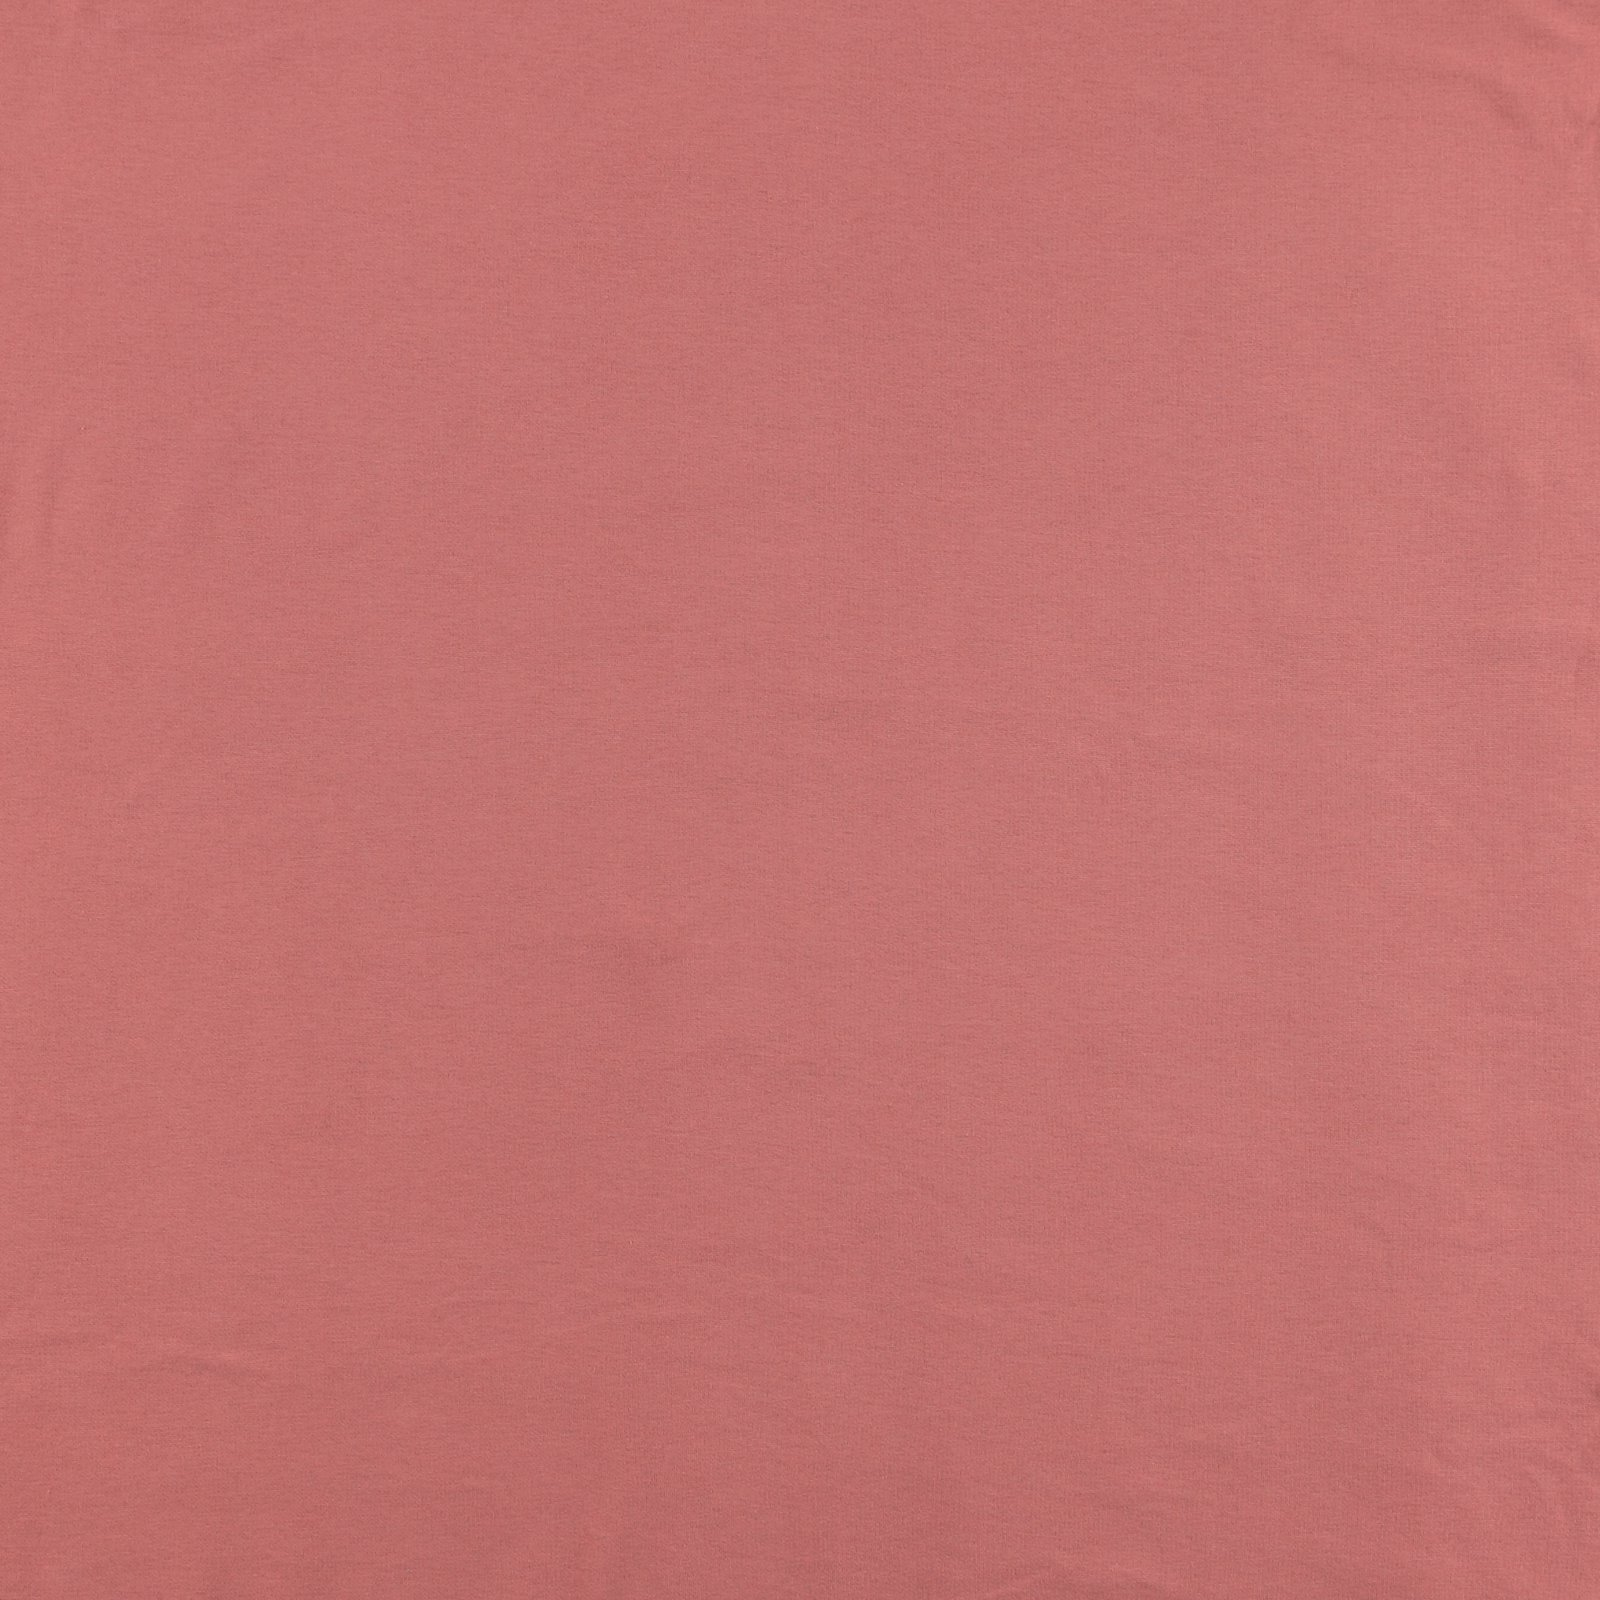 Organic rib dusty dark rose 230625_pack_solid